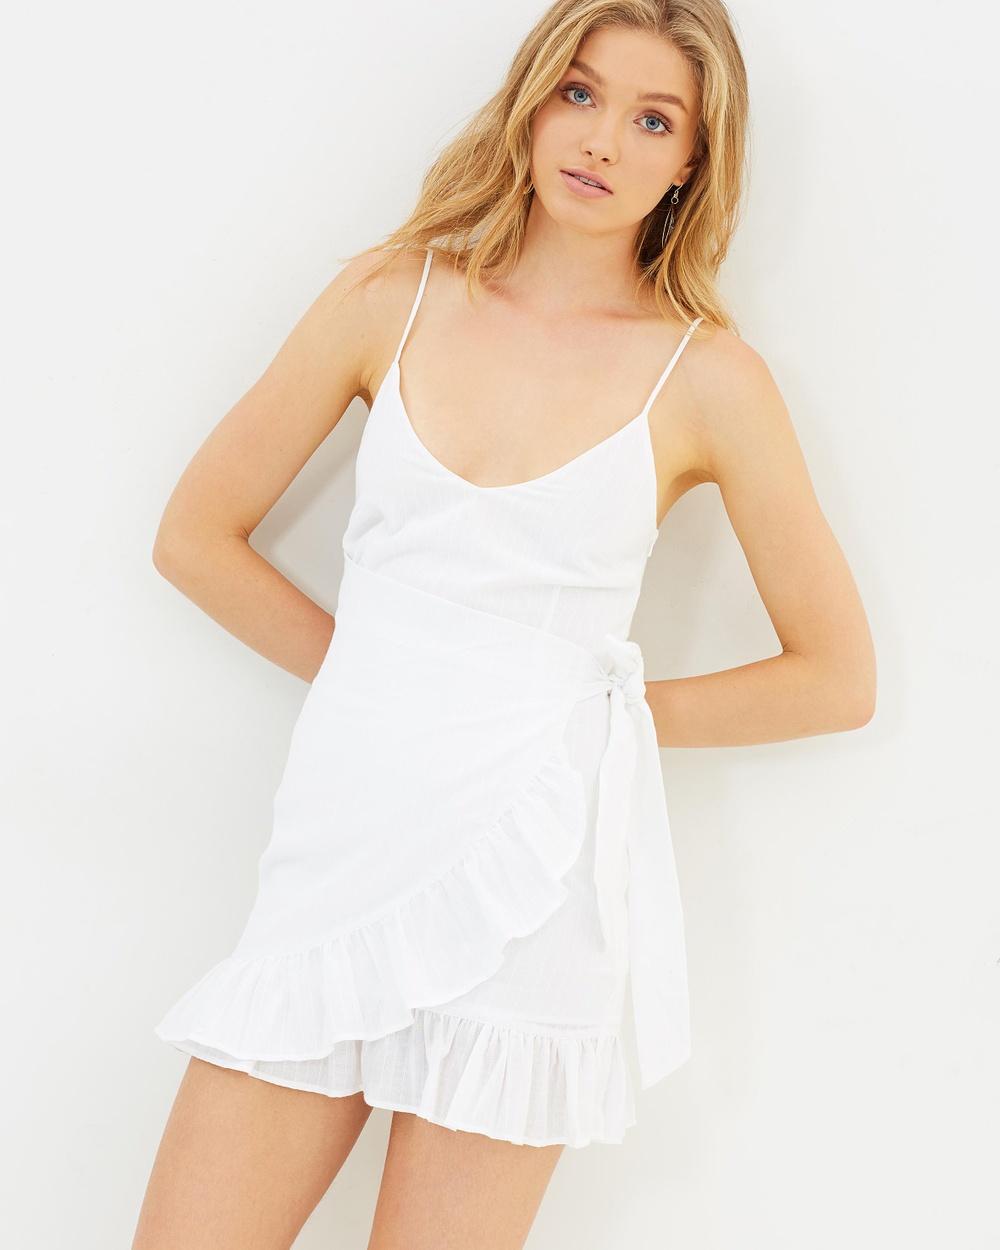 Lulu & Rose Blanca Sheer Stripe Dress Dresses White Blanca Sheer Stripe Dress